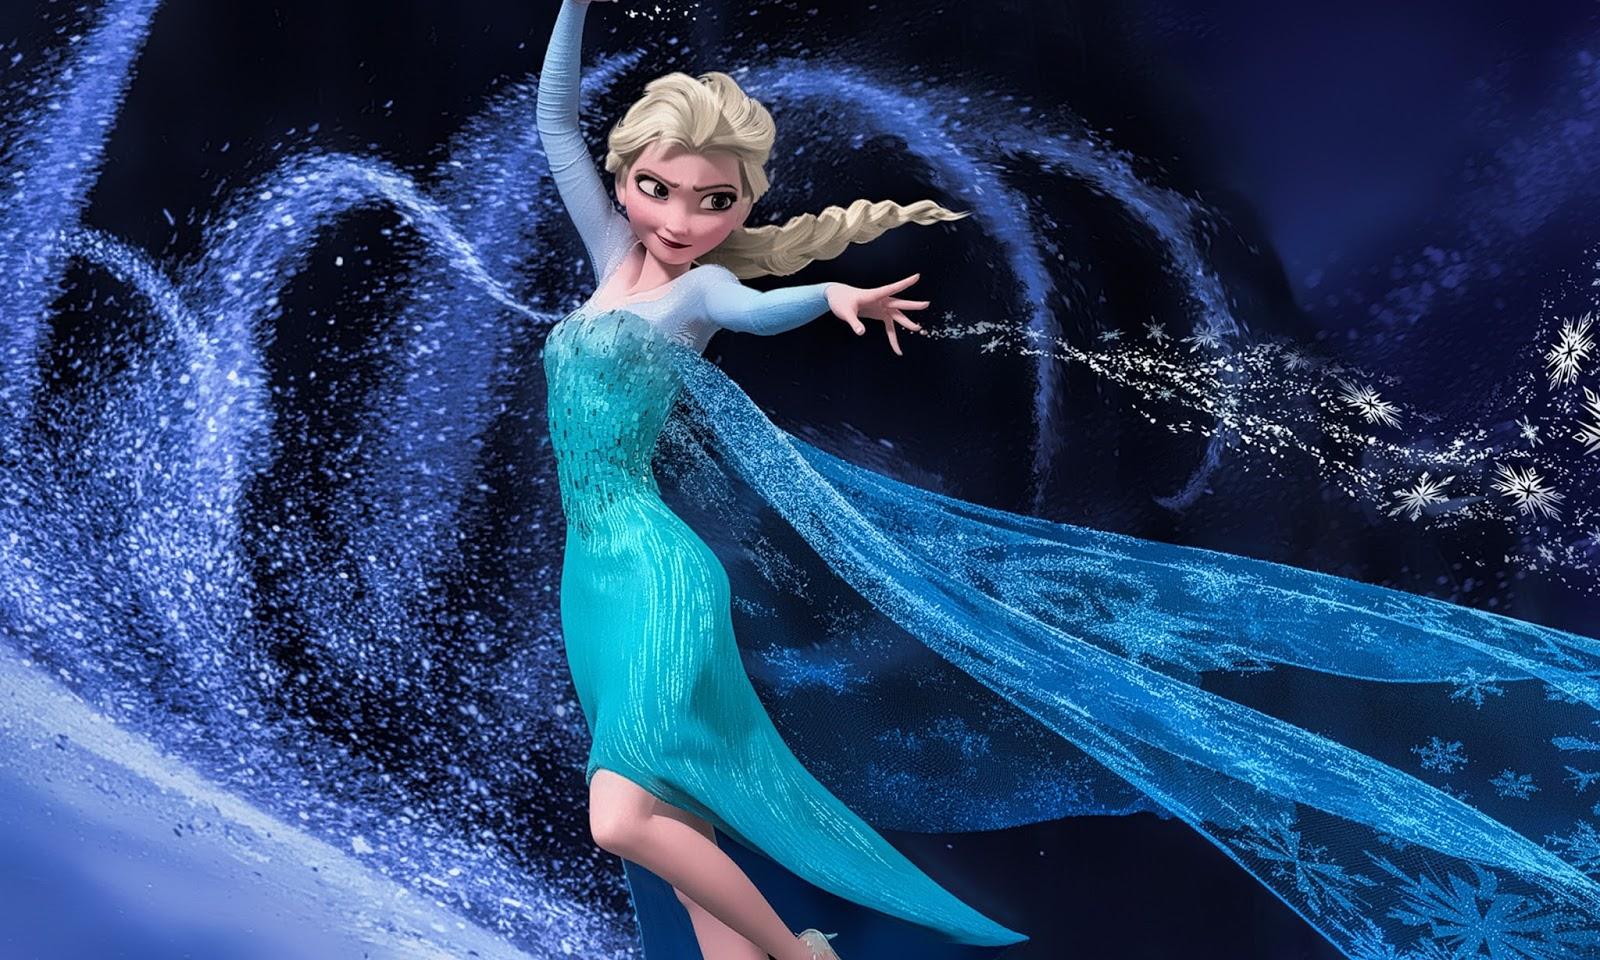 frozen movie wallpaper,cg artwork,water,fictional character,dancer